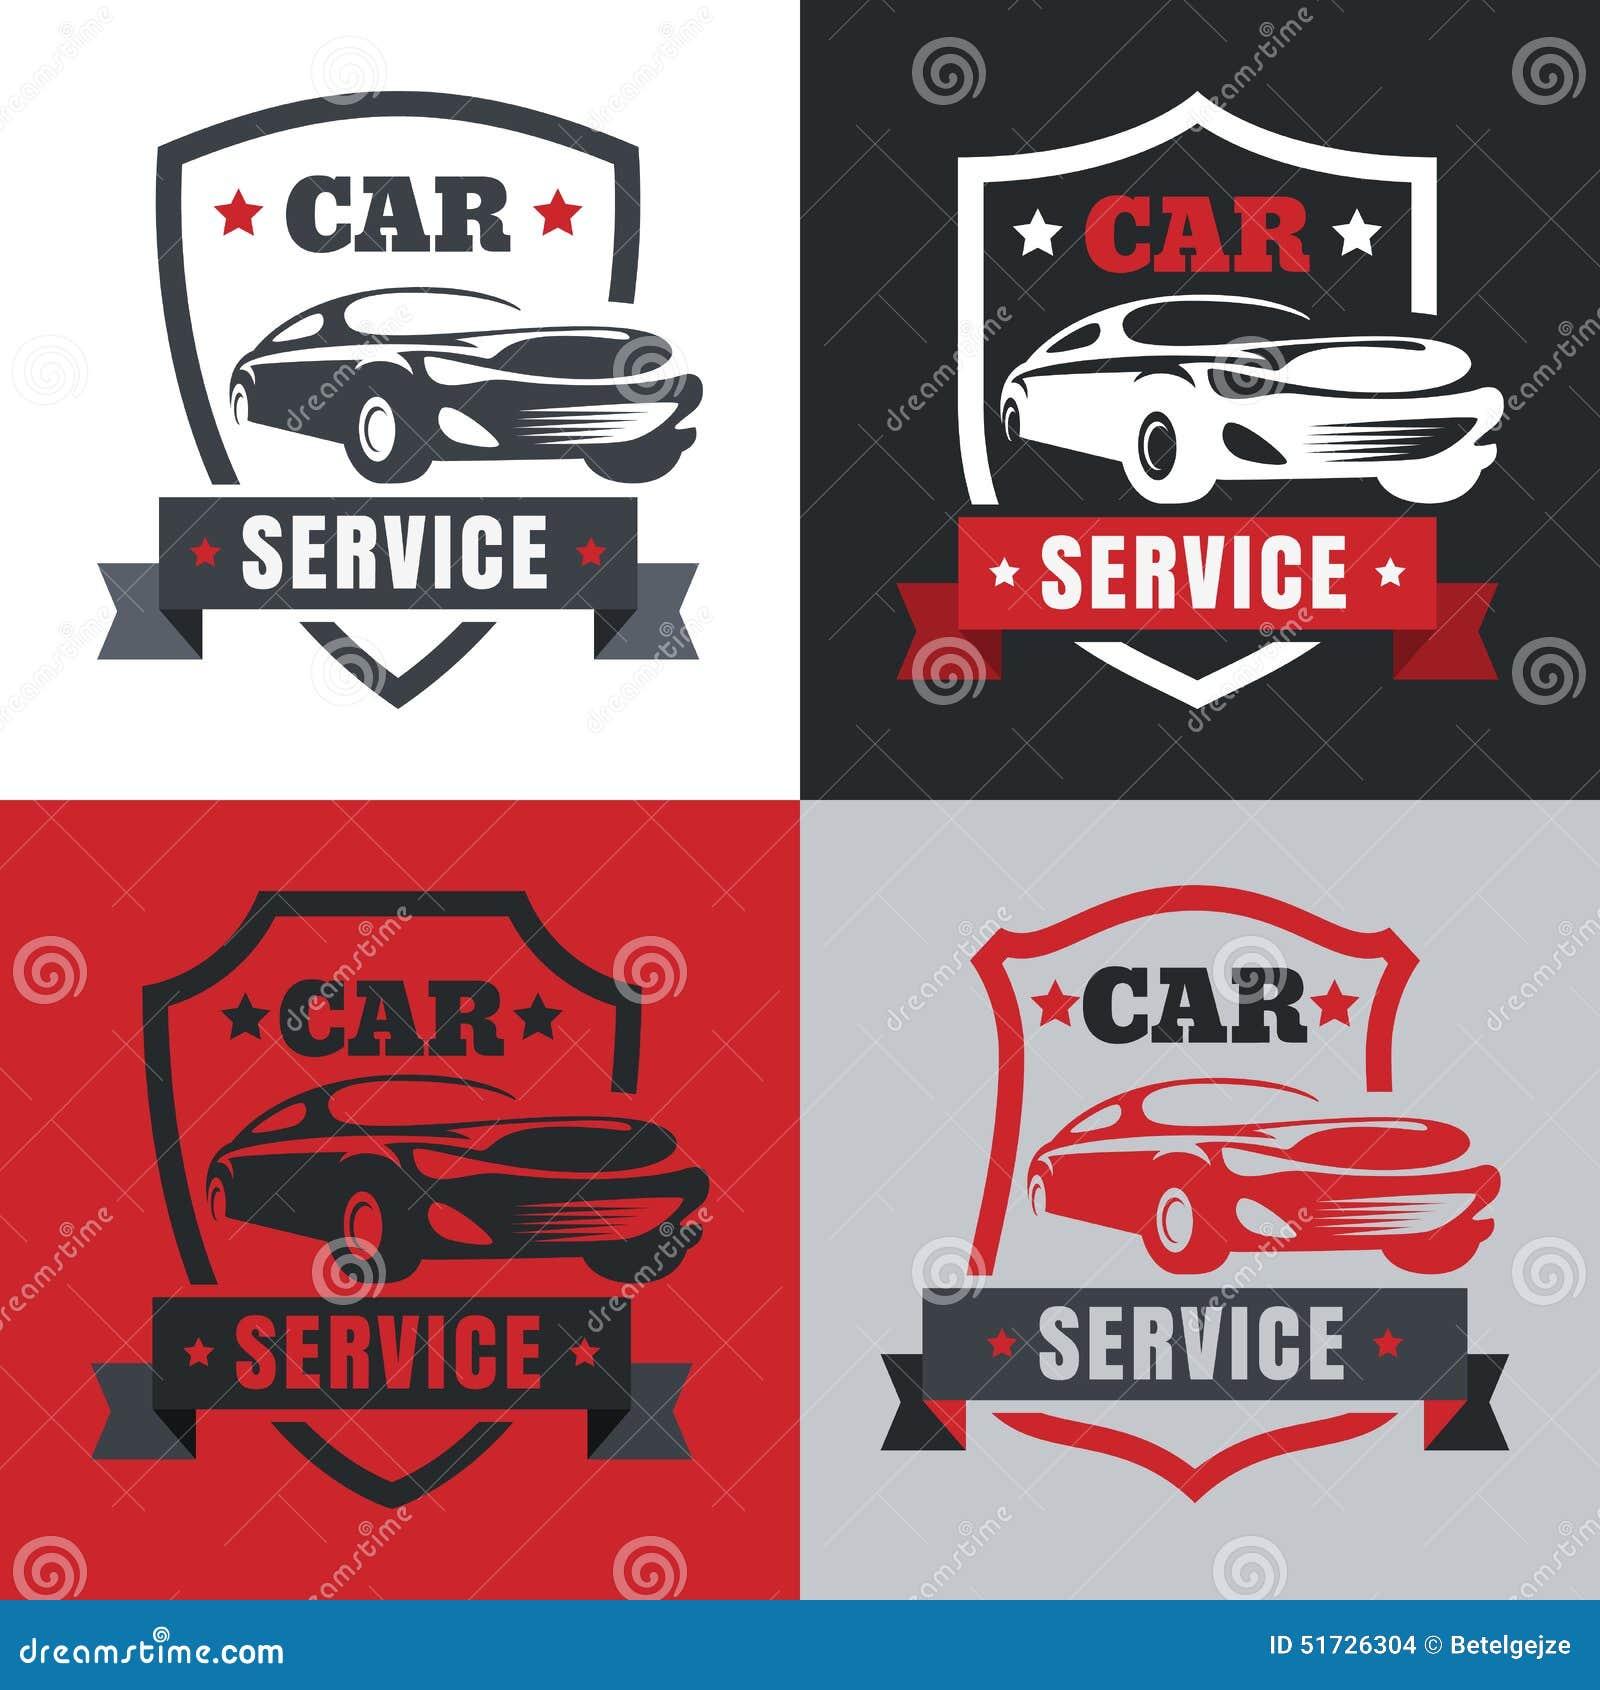 California Car Cover Co Official Site  Custom Fit Car